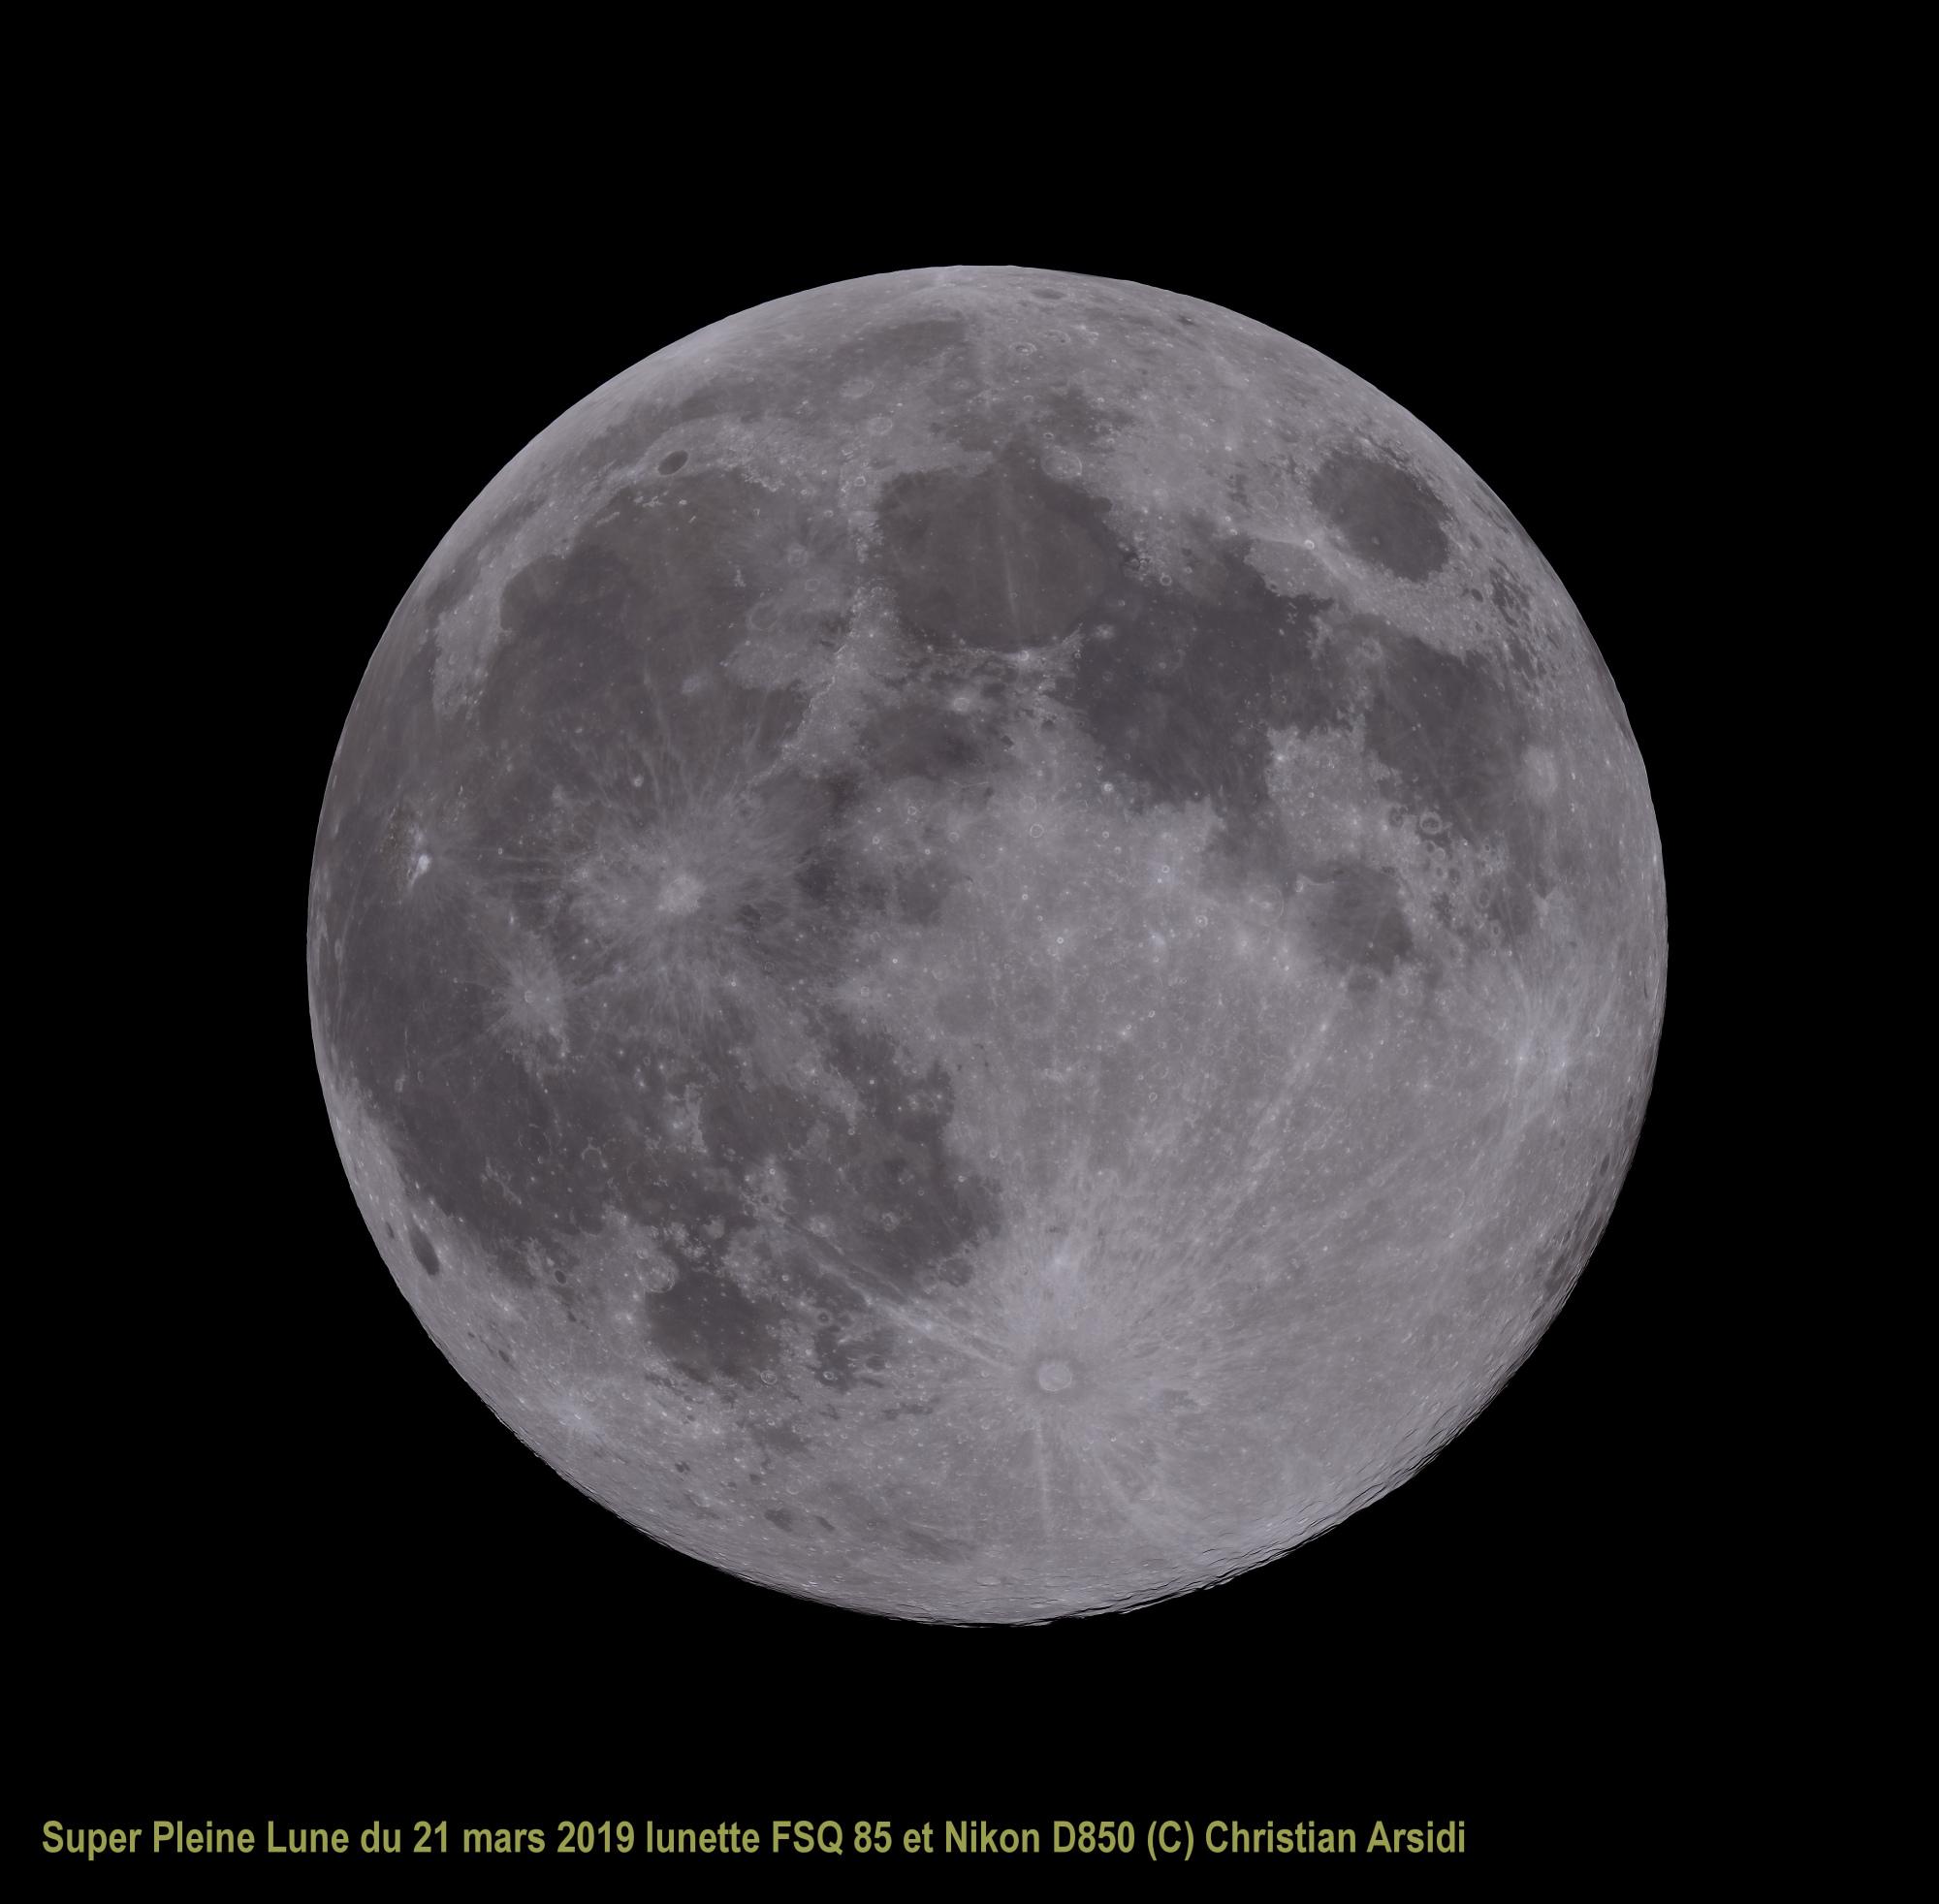 La Pleine Lune 45 images BV recadrée TTB 100 % JPEG.jpg